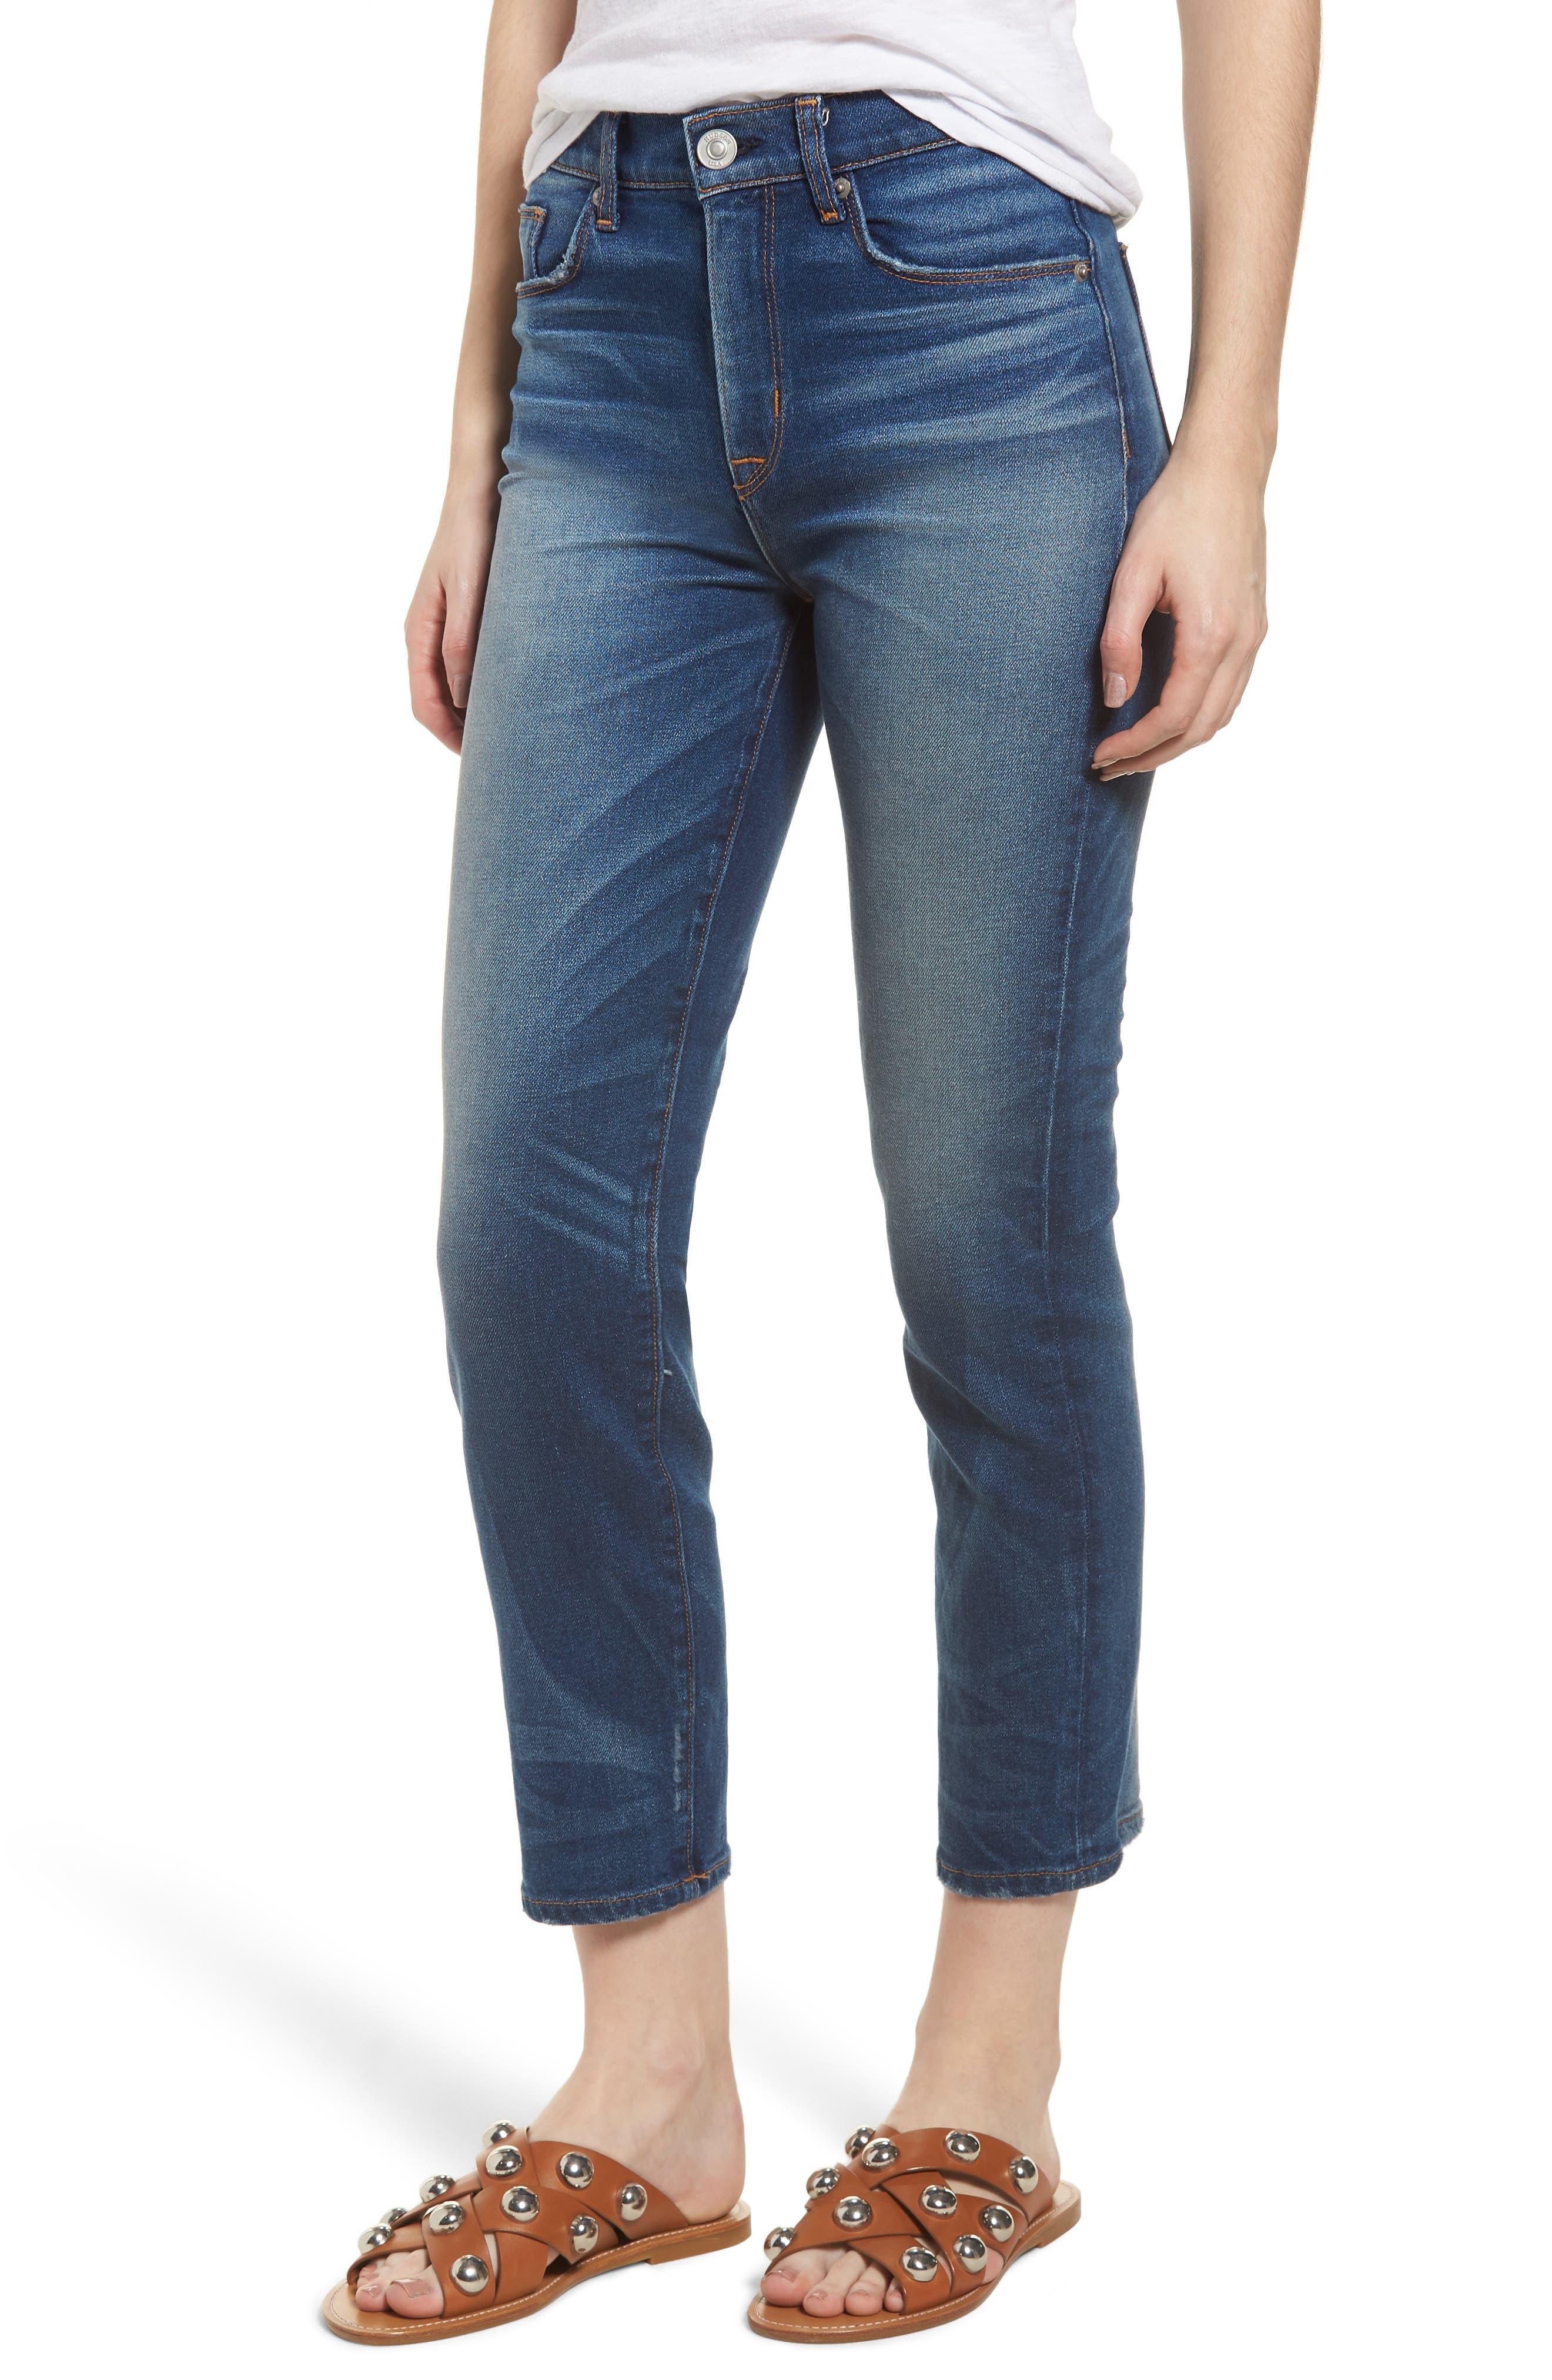 Zoeey High Waist Crop Straight Leg Jeans,                         Main,                         color, 420